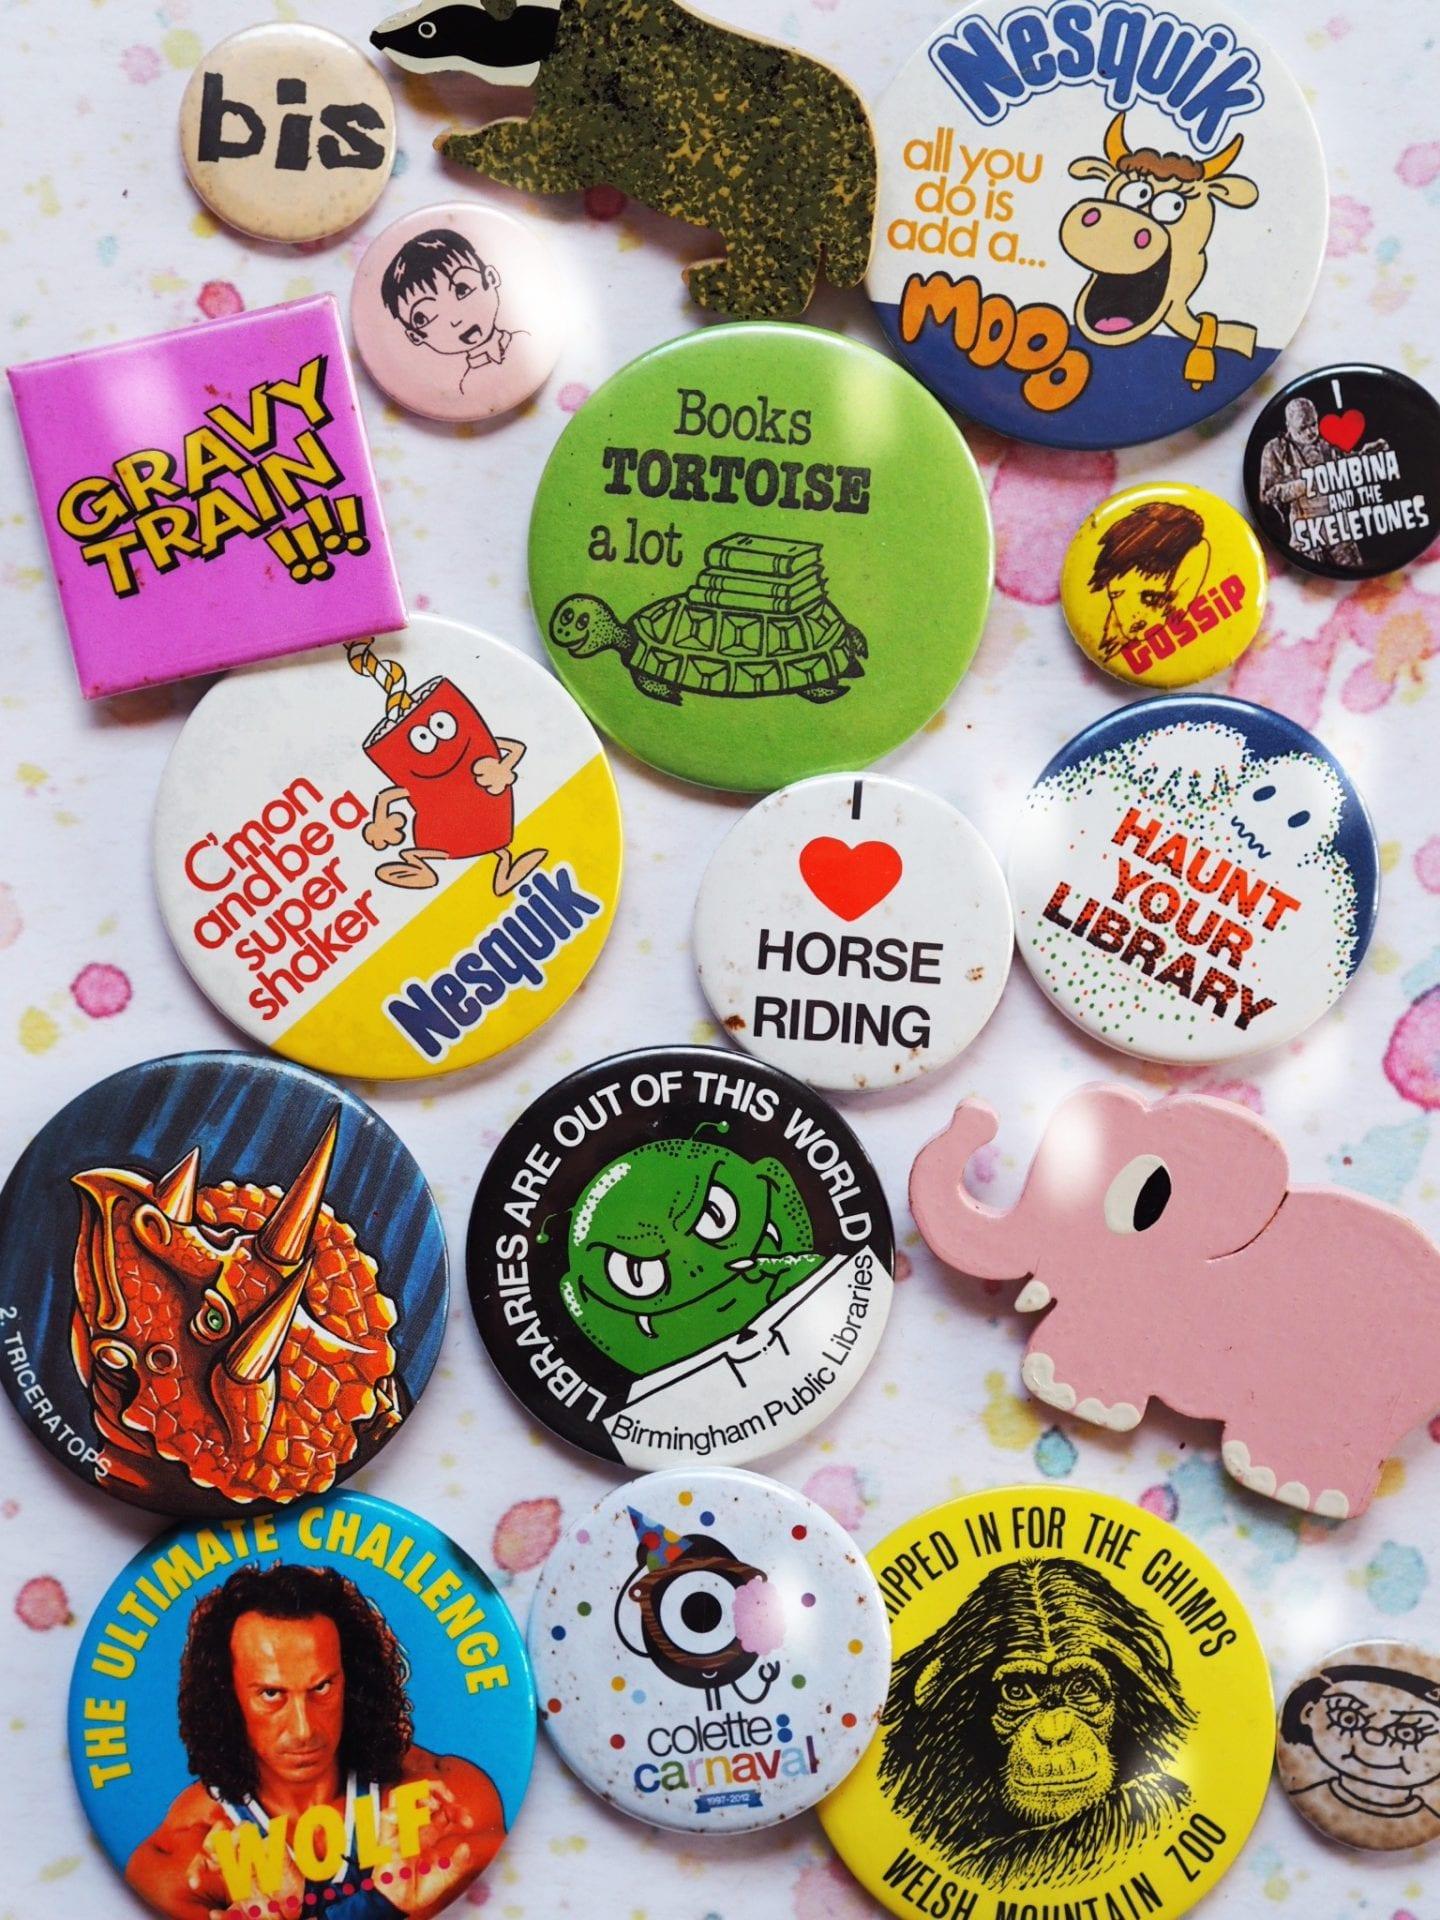 vintage-80s-90s-badges-retro-kitsch-nostalgic